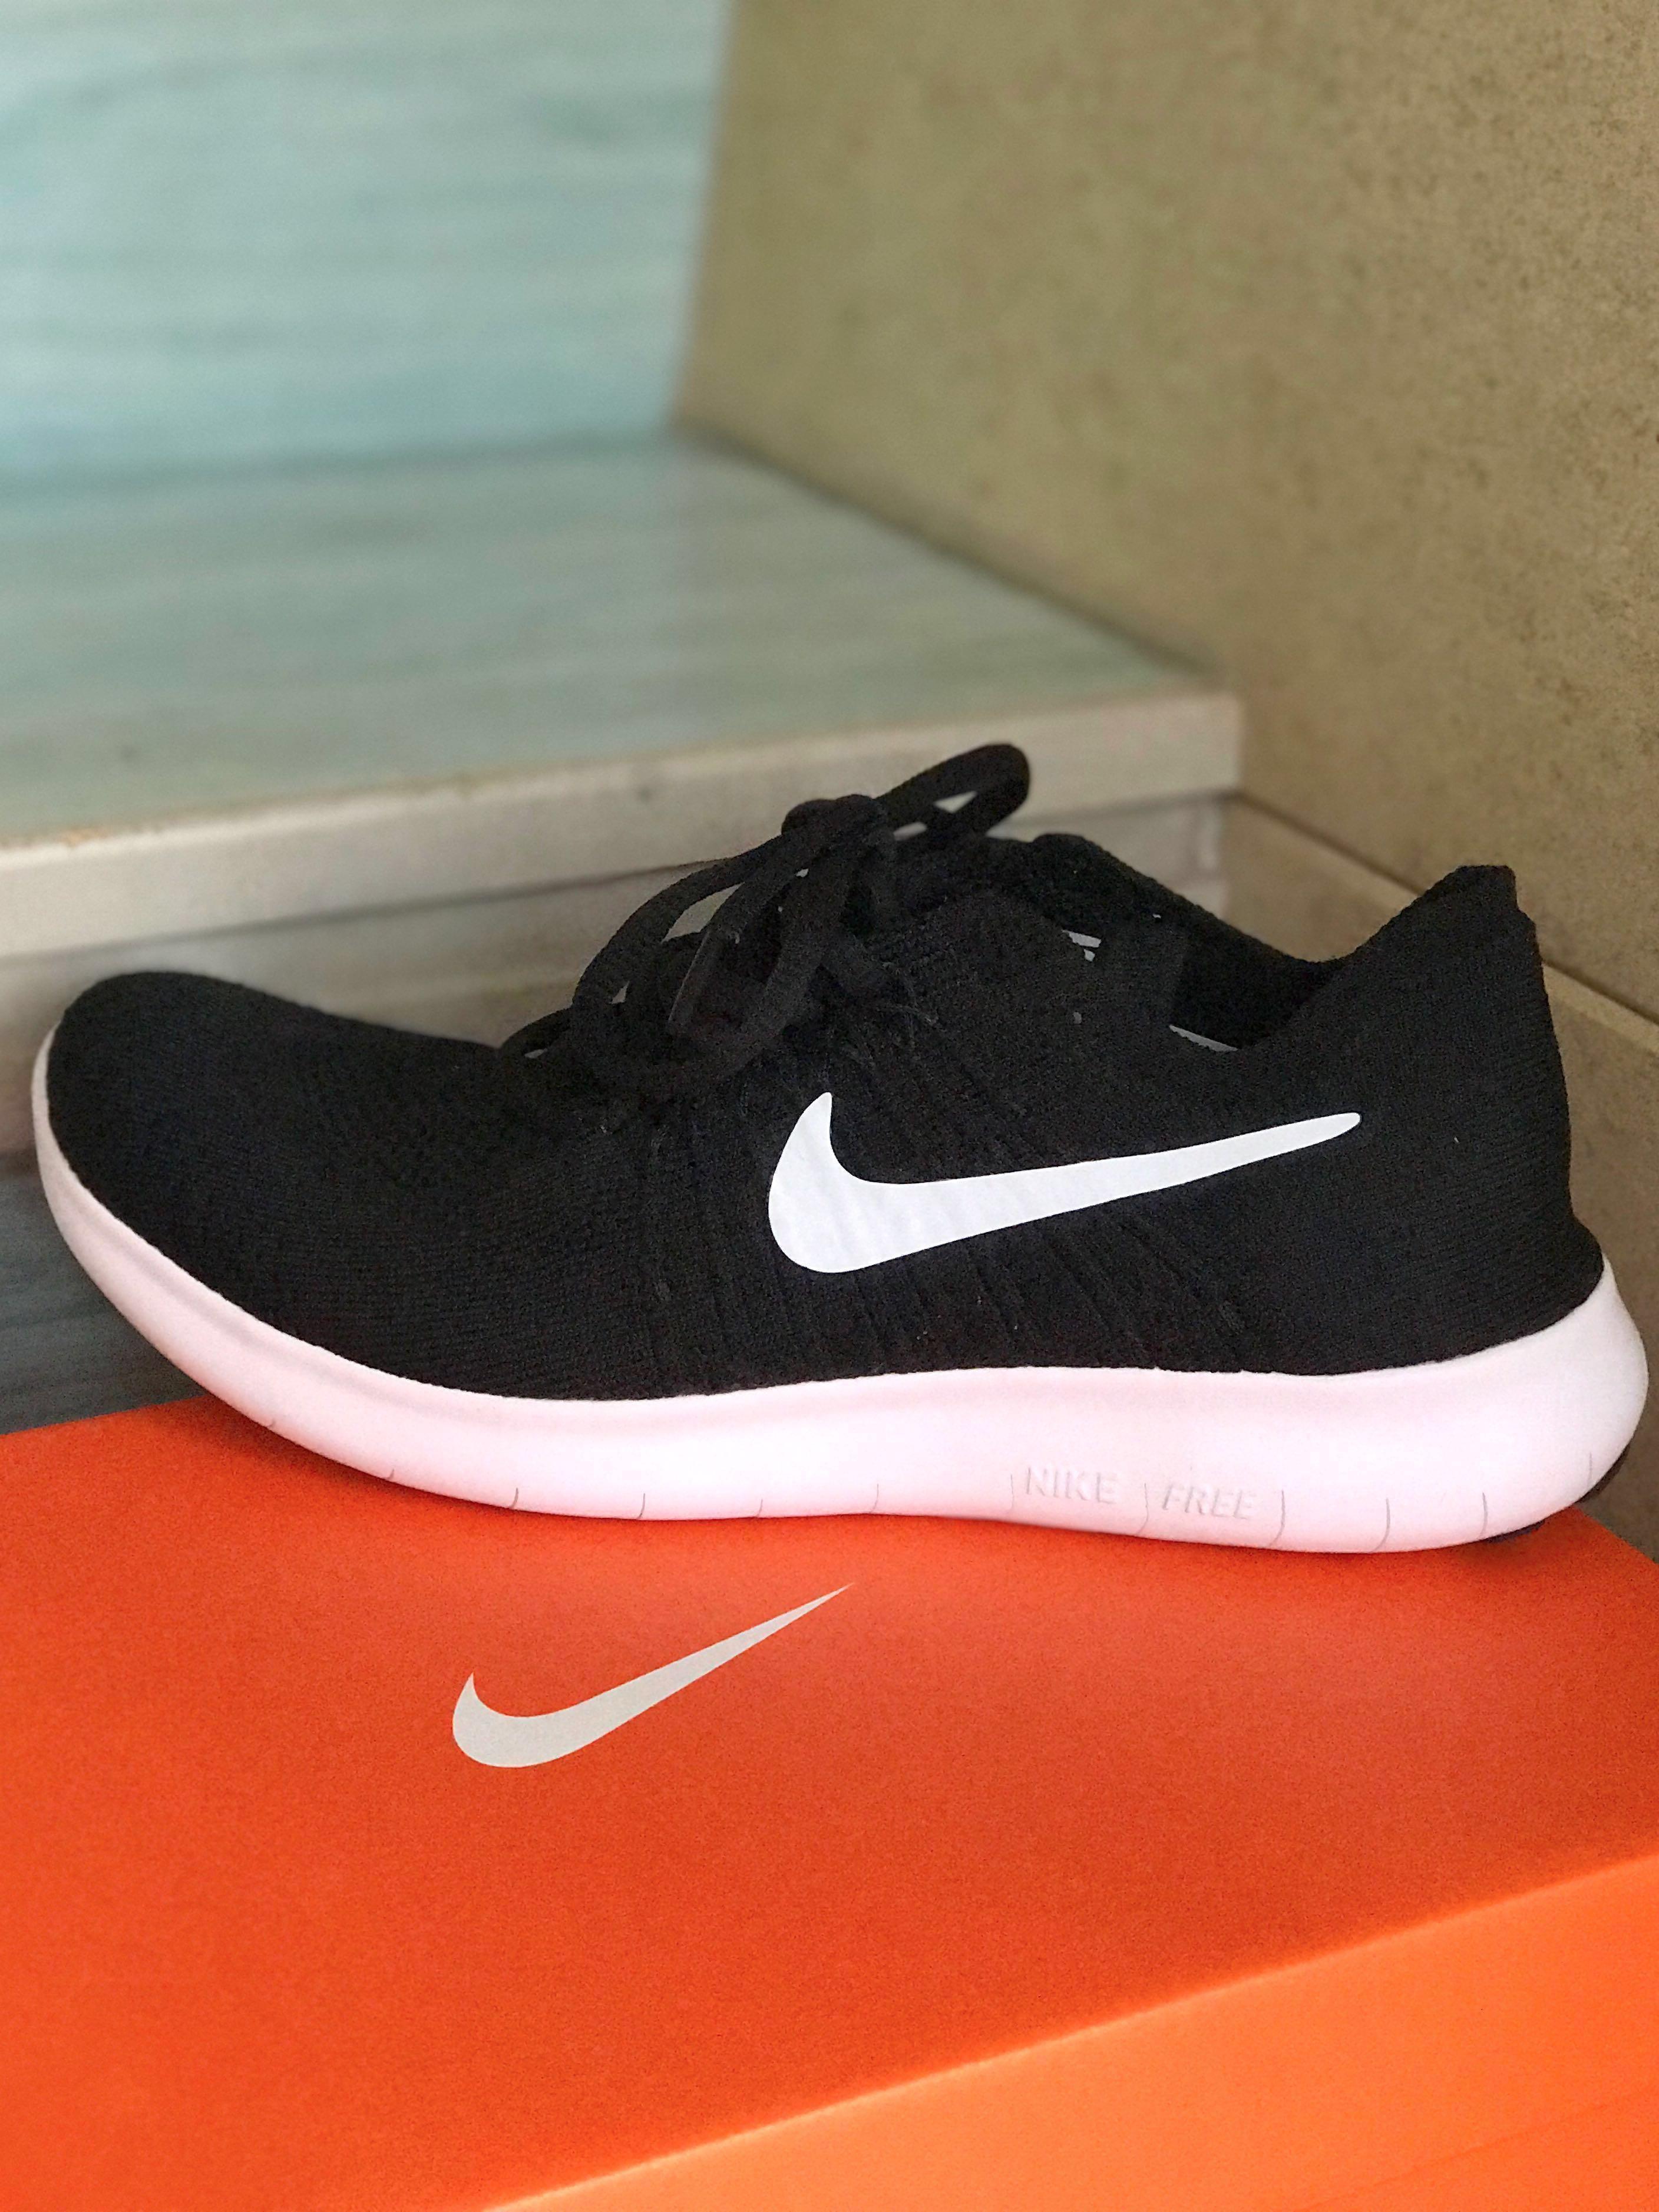 best cheap d6e0c 2b33b NIKE Free Rn Flyknit 2017 Women's BN, Women's Fashion, Shoes ...